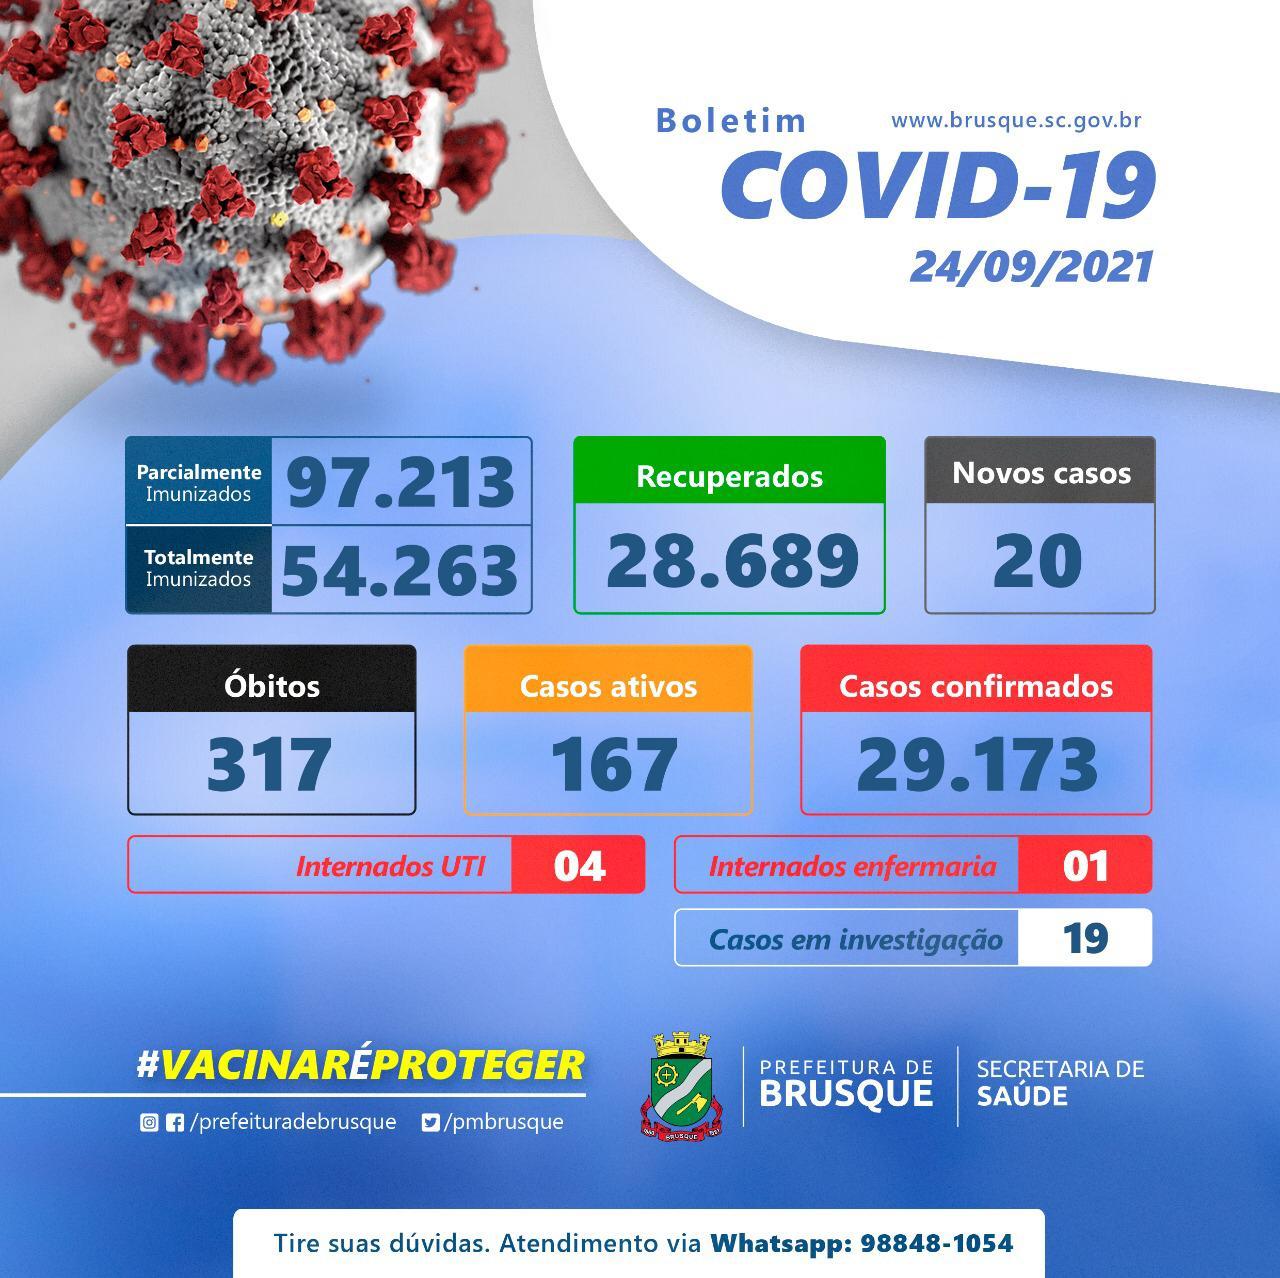 Covid-19: Confira o boletim epidemiológico desta sexta-feira (24)